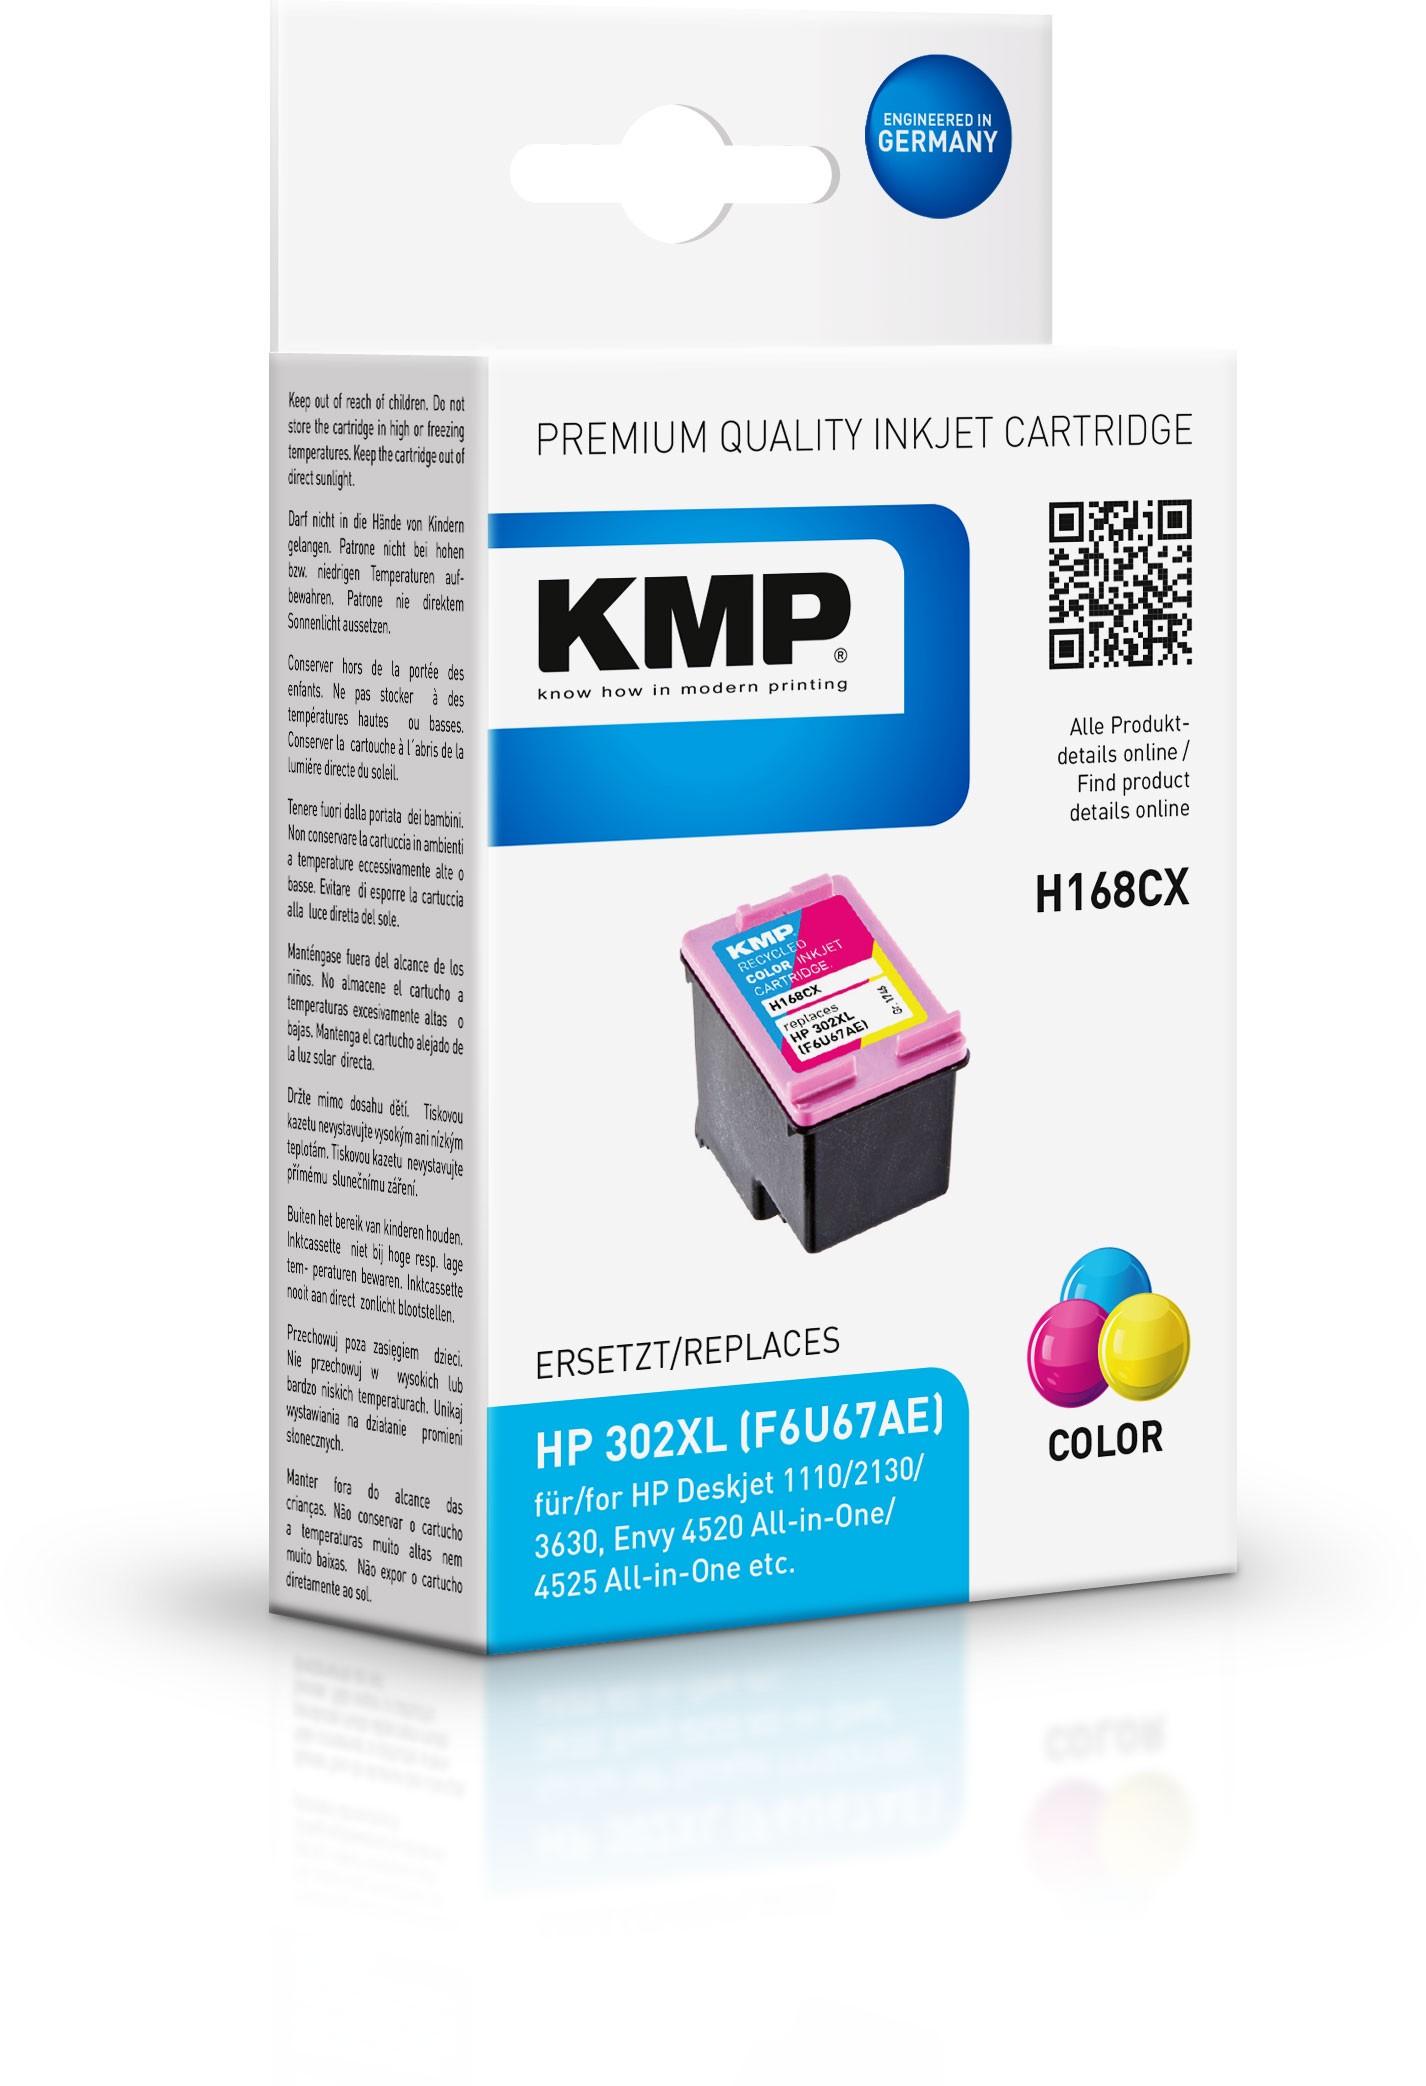 KMP Patrone H168CX für Deskjet 1110 Deskjet 2130 etc. color